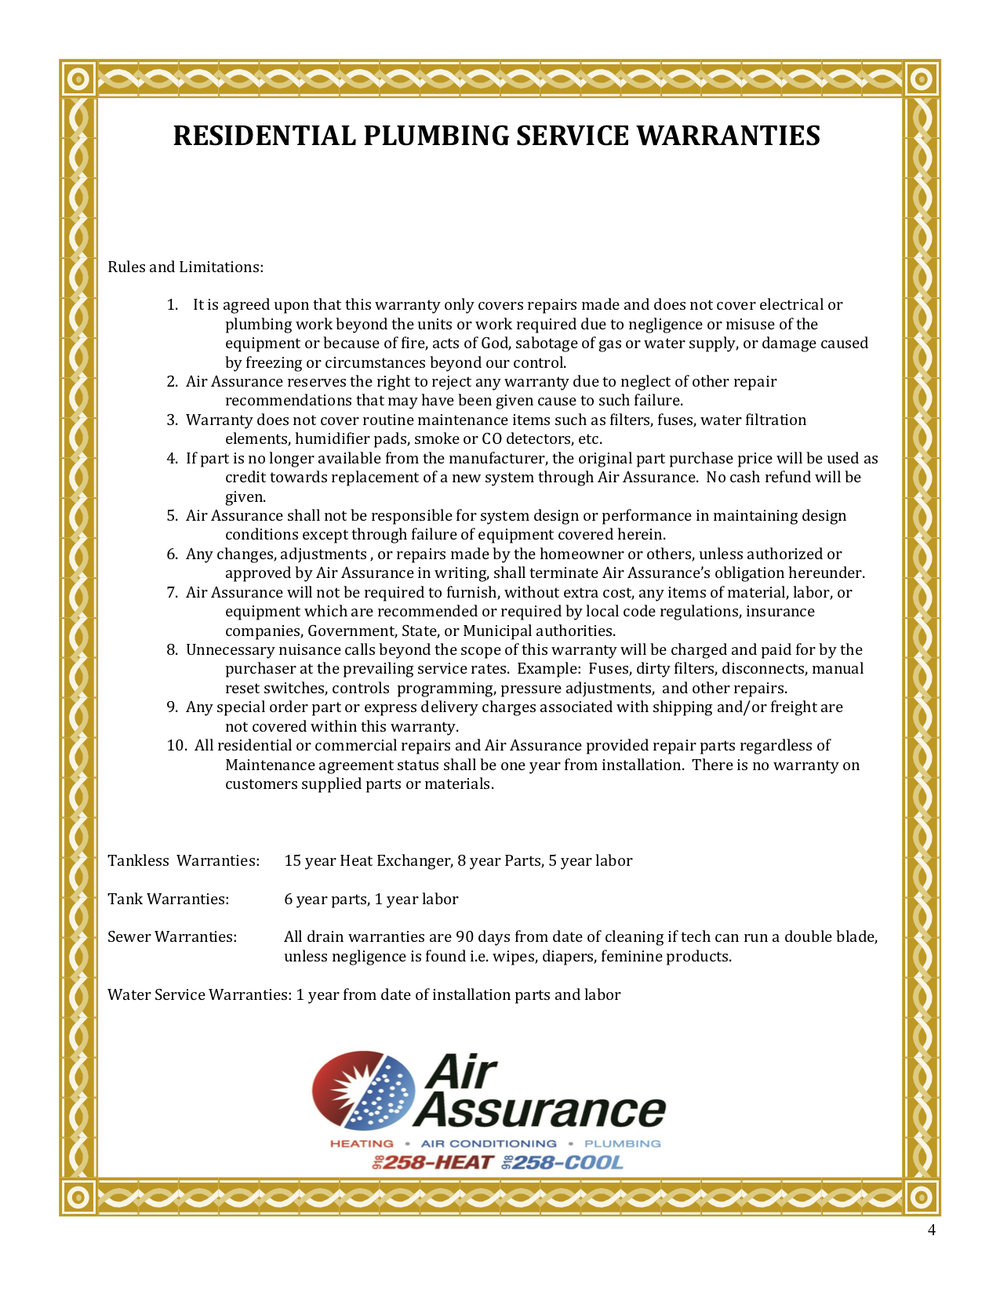 Residential Plumbing Service Warranties.jpg